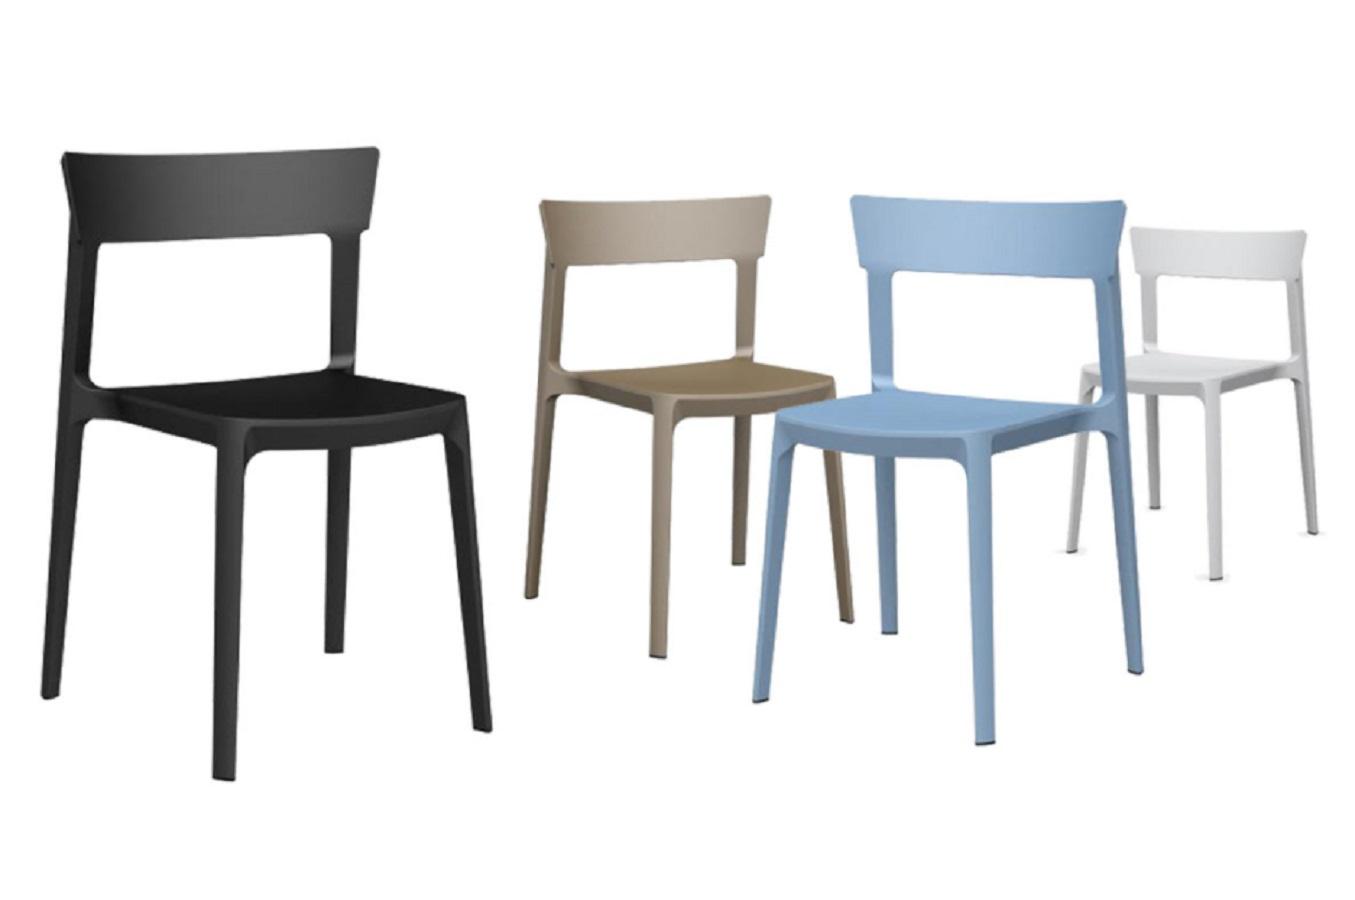 Calligaris offerta sedia moderna impilabile modello skin mobil discount - Sedia skin calligaris ...